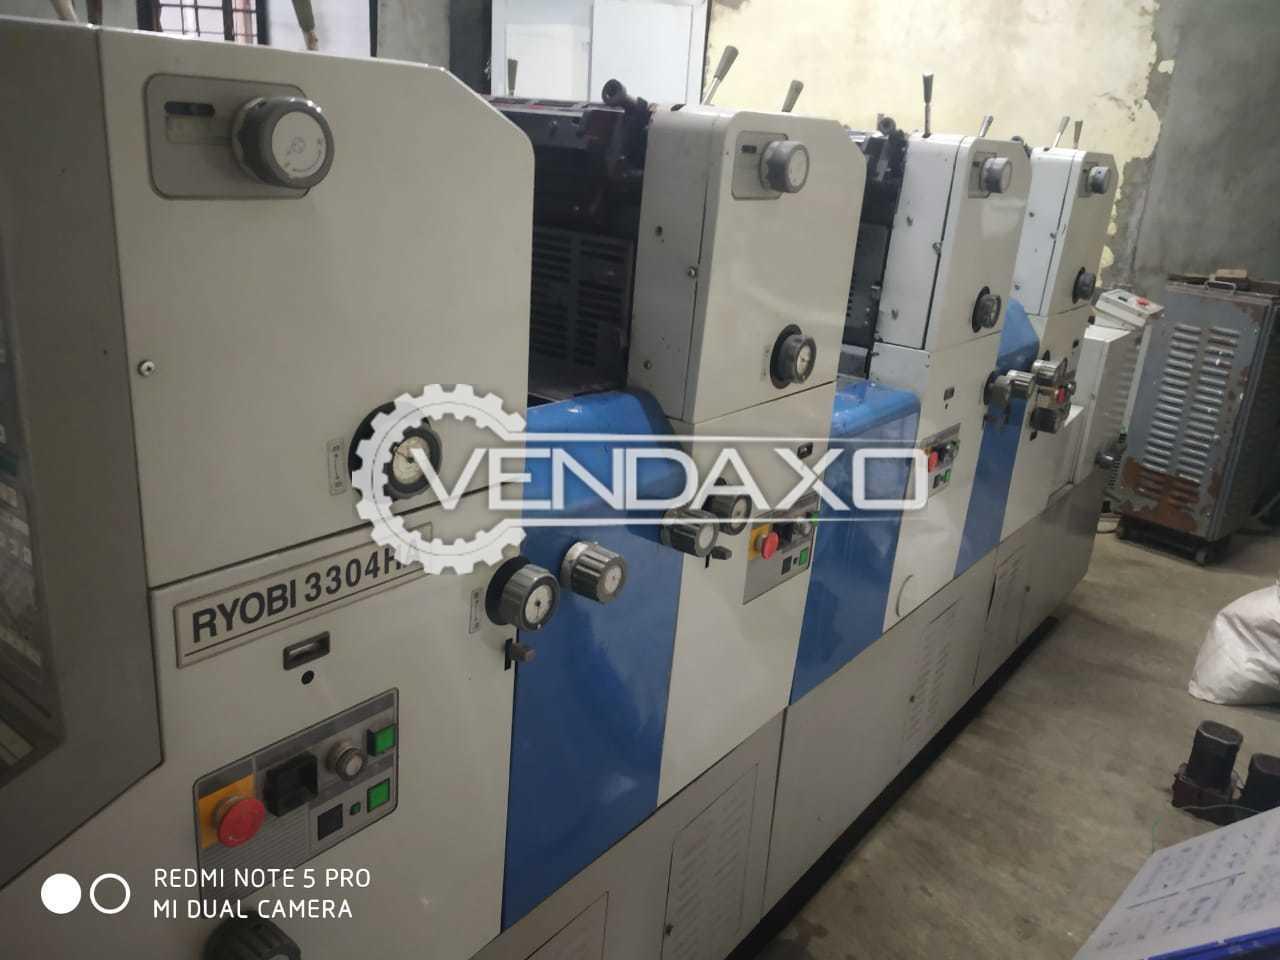 Ryobi 3304 HA Offset Printing Machine - 13 x 18 Inch, 4 Color